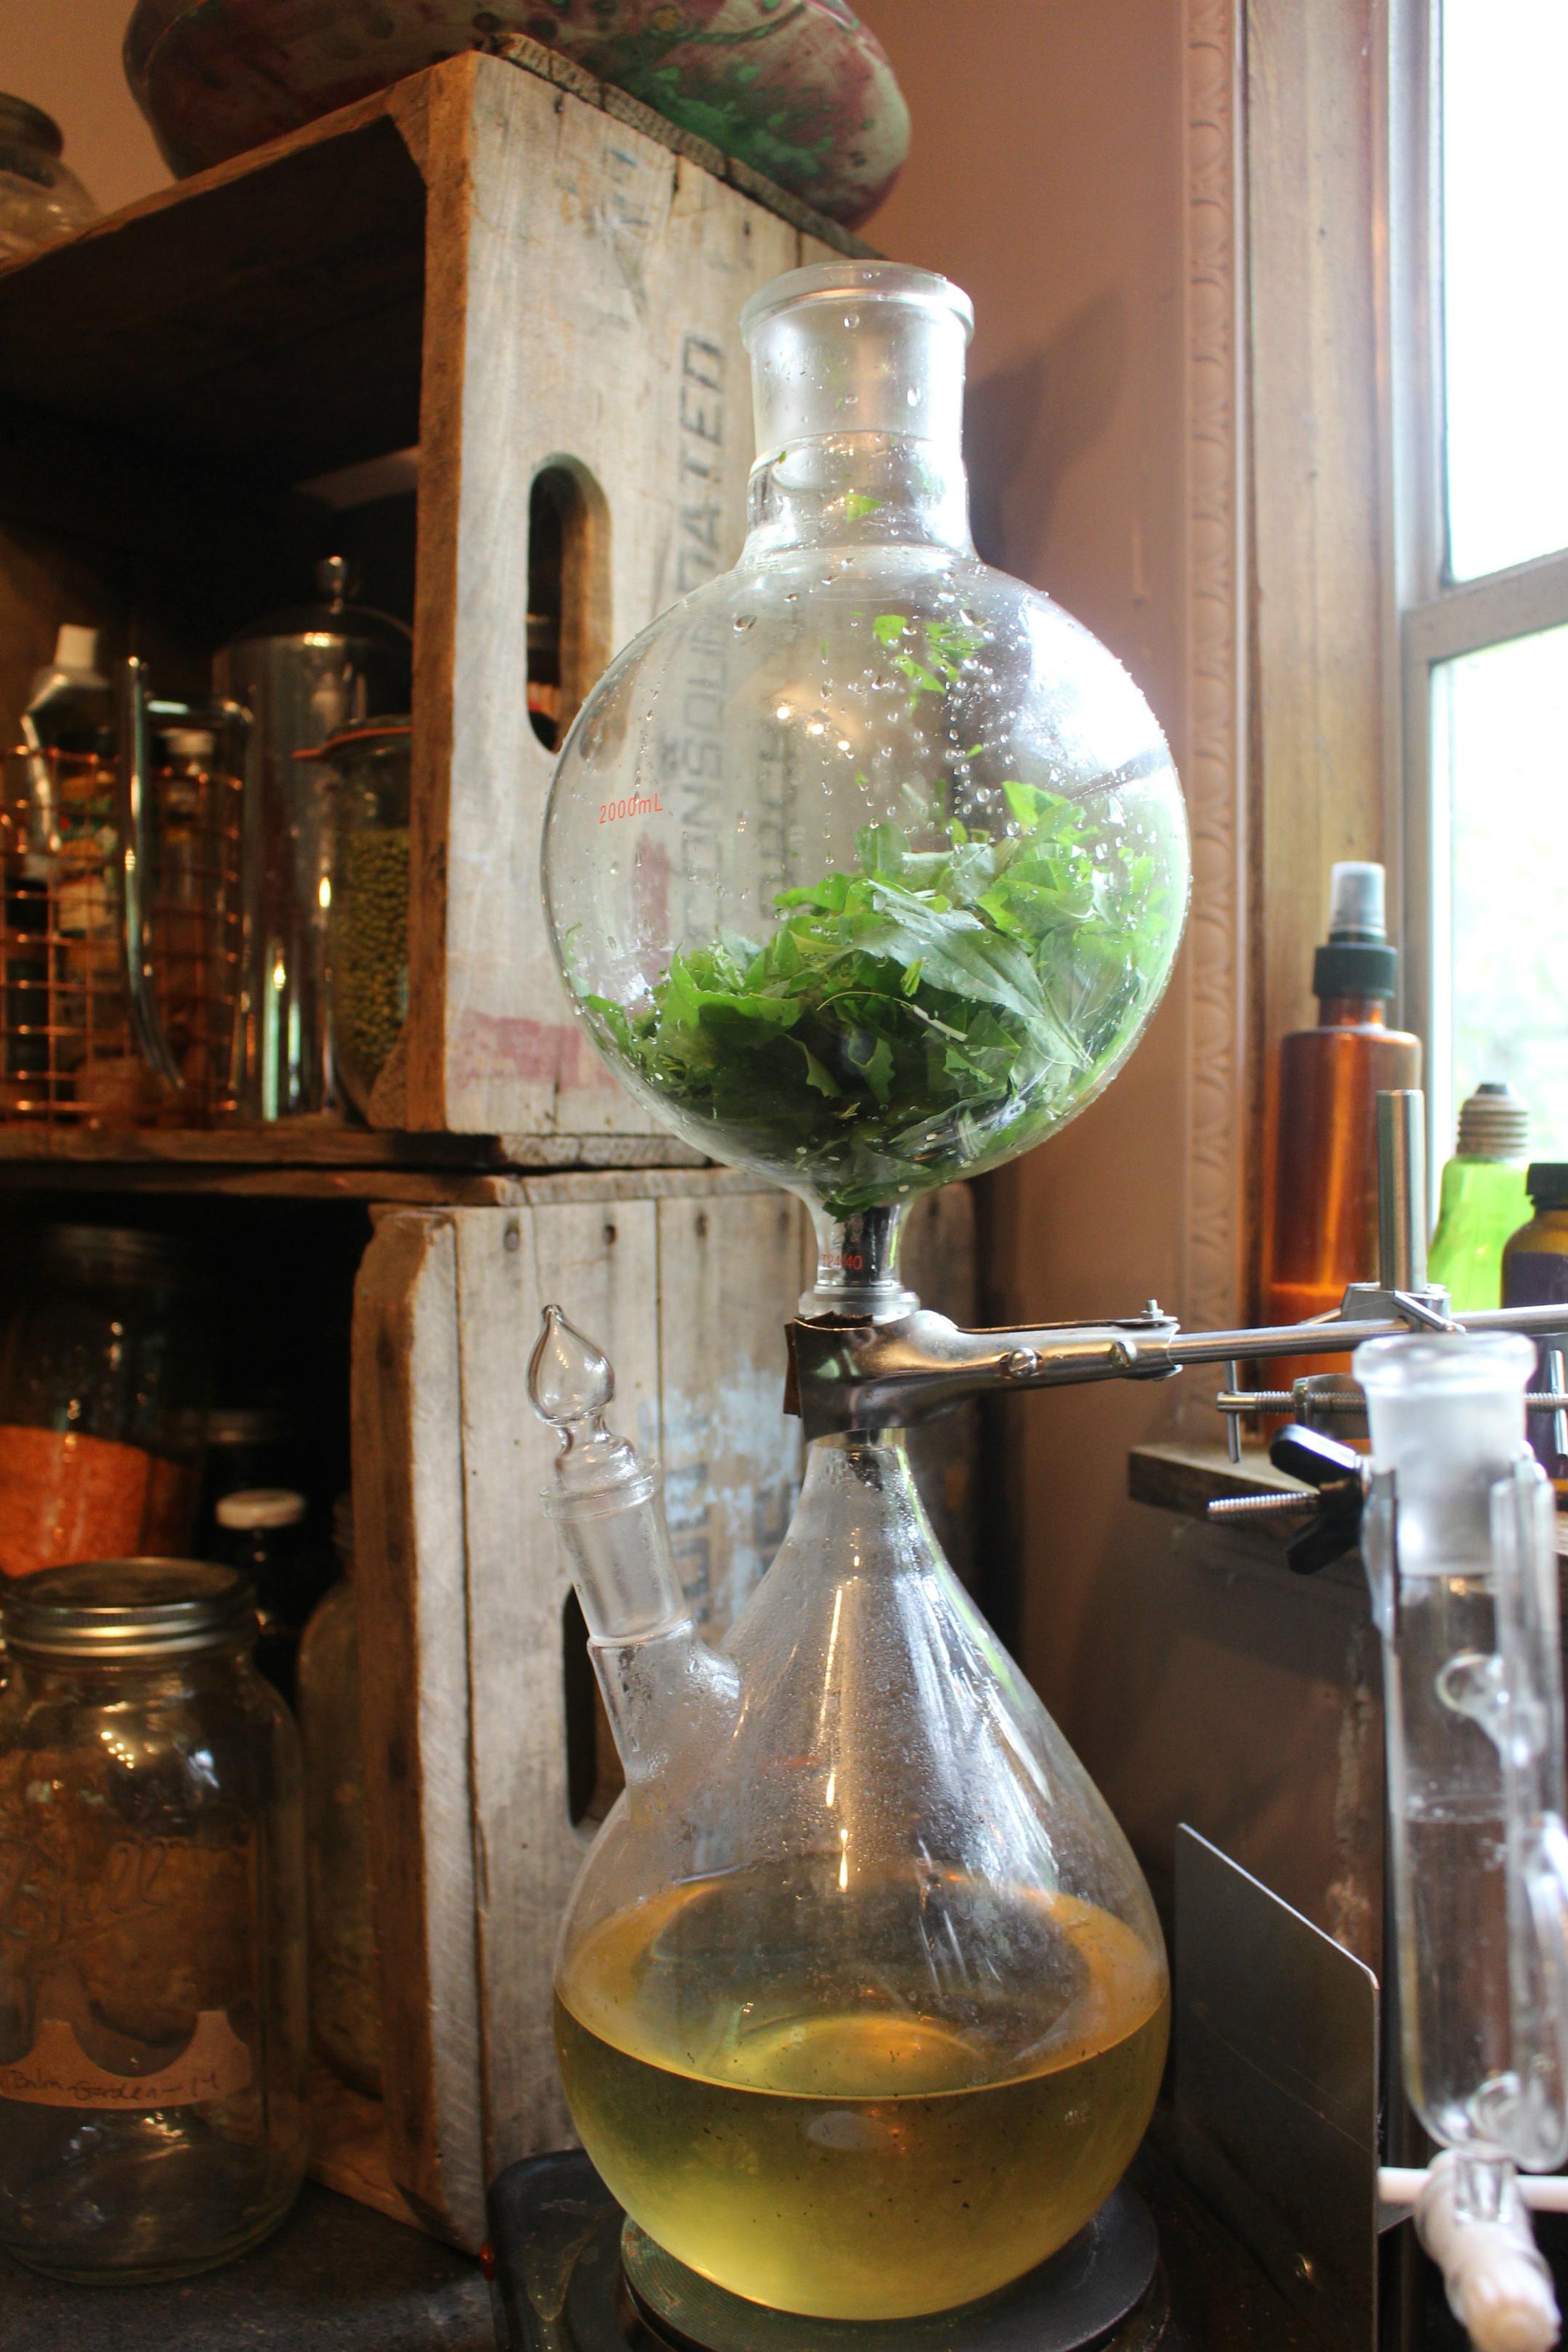 A Steam Distiller filled with plantain leaf